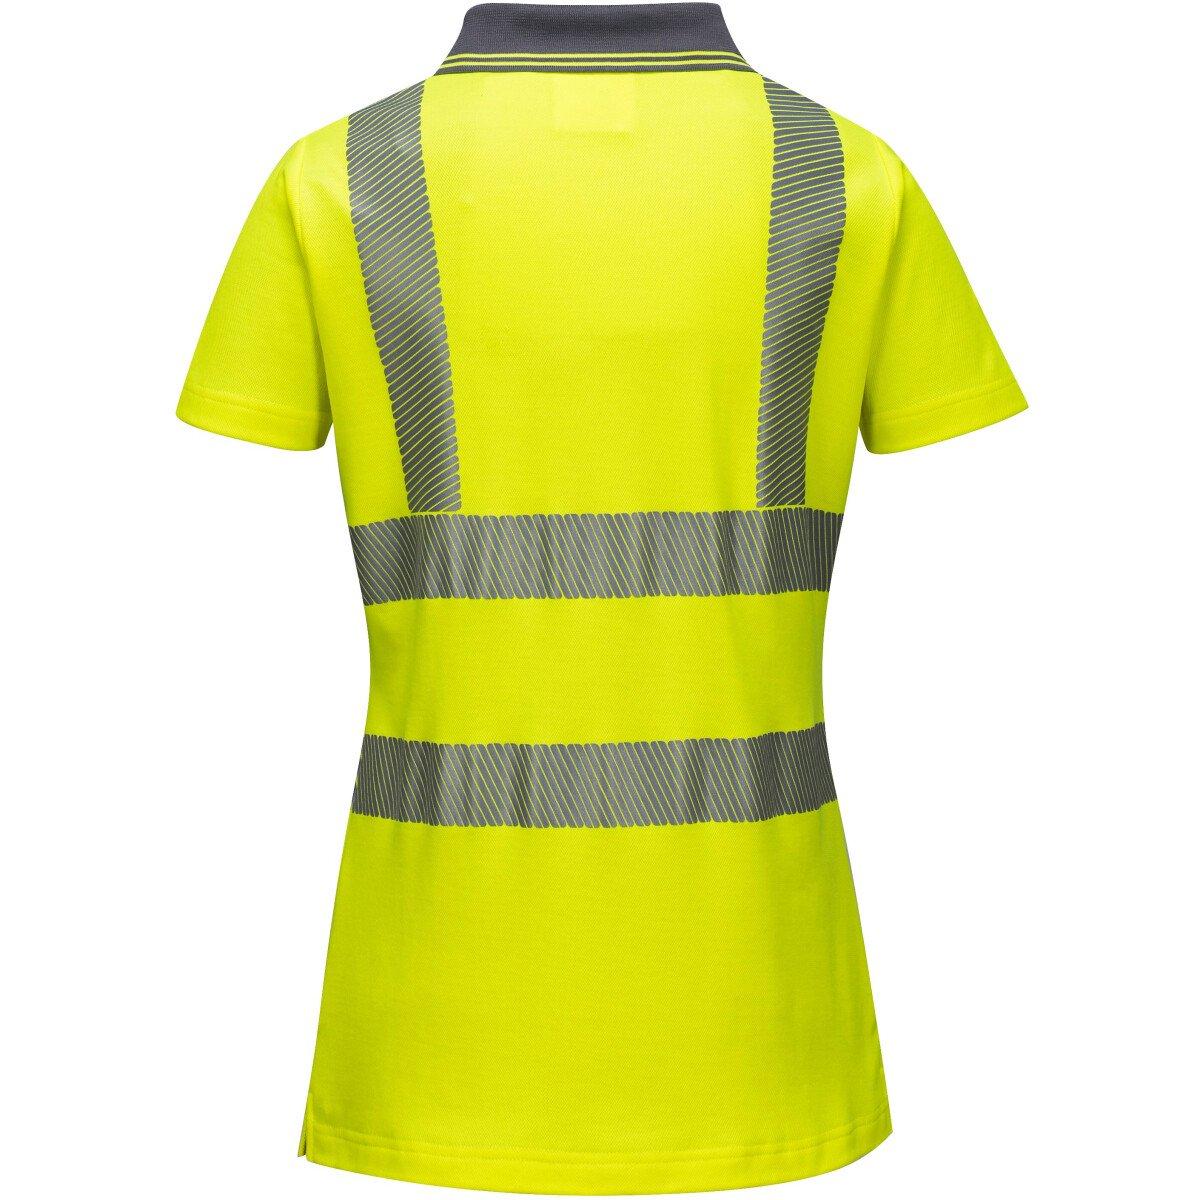 More Views. Portwest LW72 Ladies Hi-Vis Pro Polo Shirt High Visibility -  Yellow c8402e804